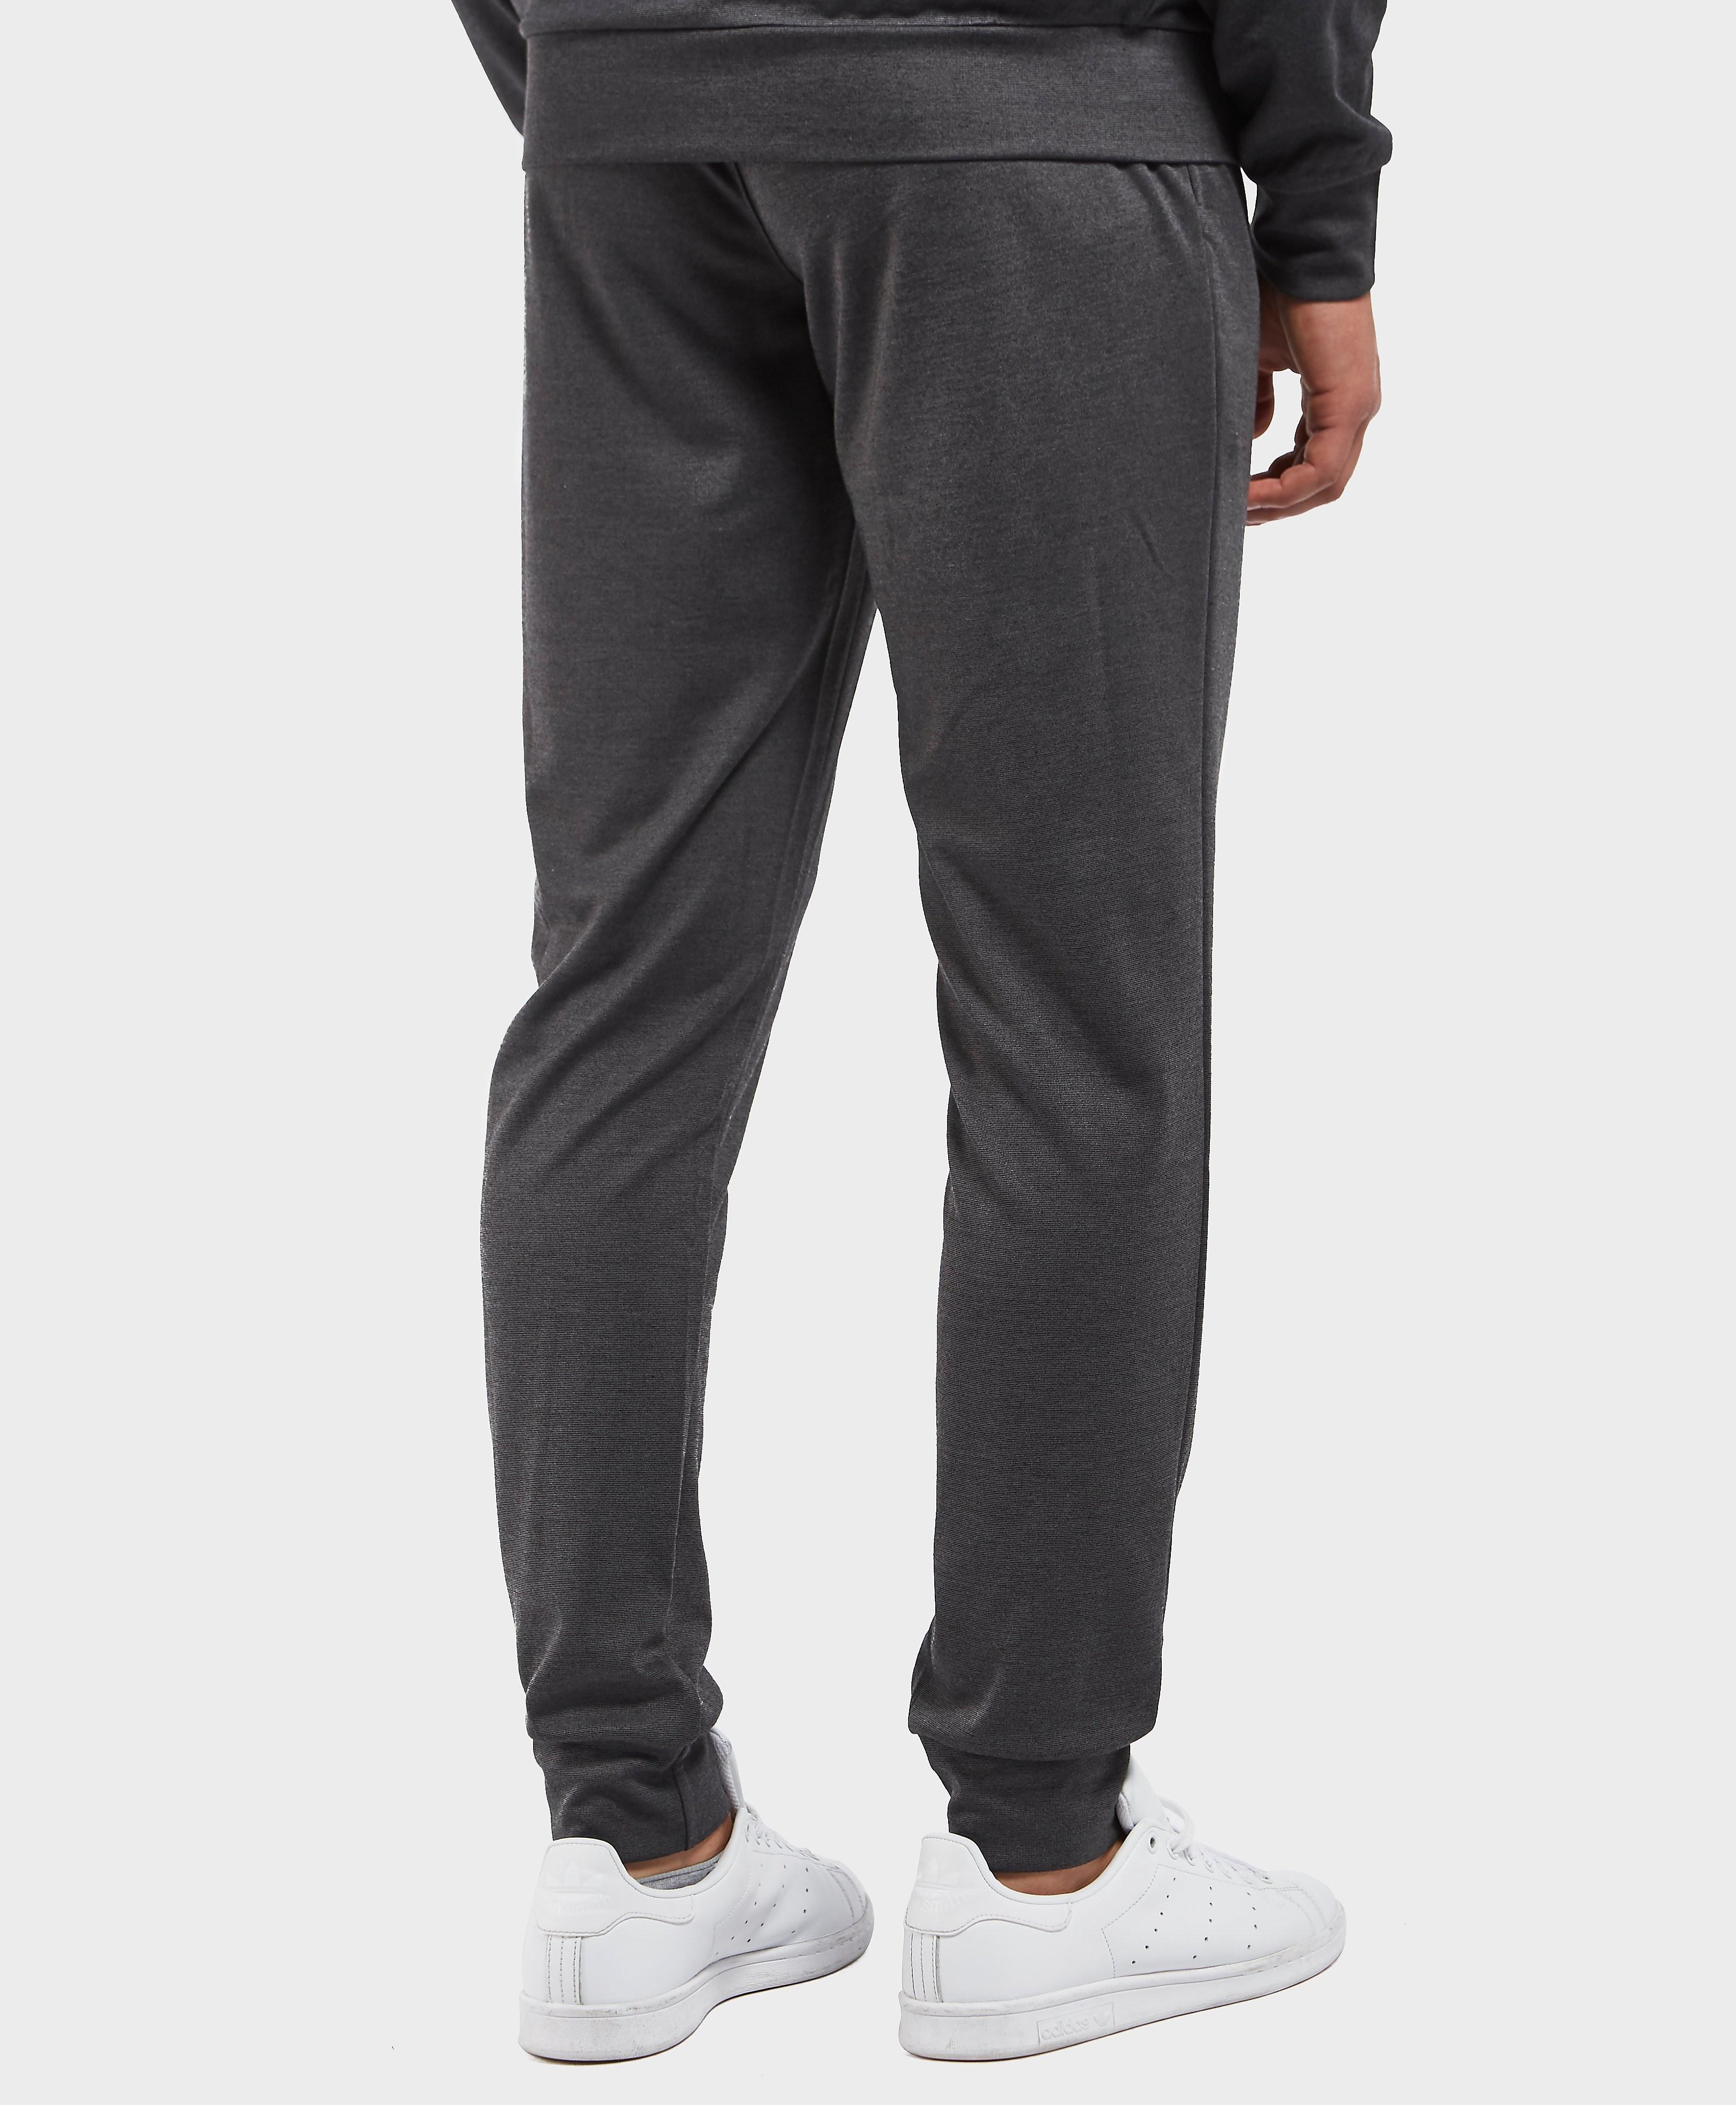 Emporio Armani Cuffed Track Pants